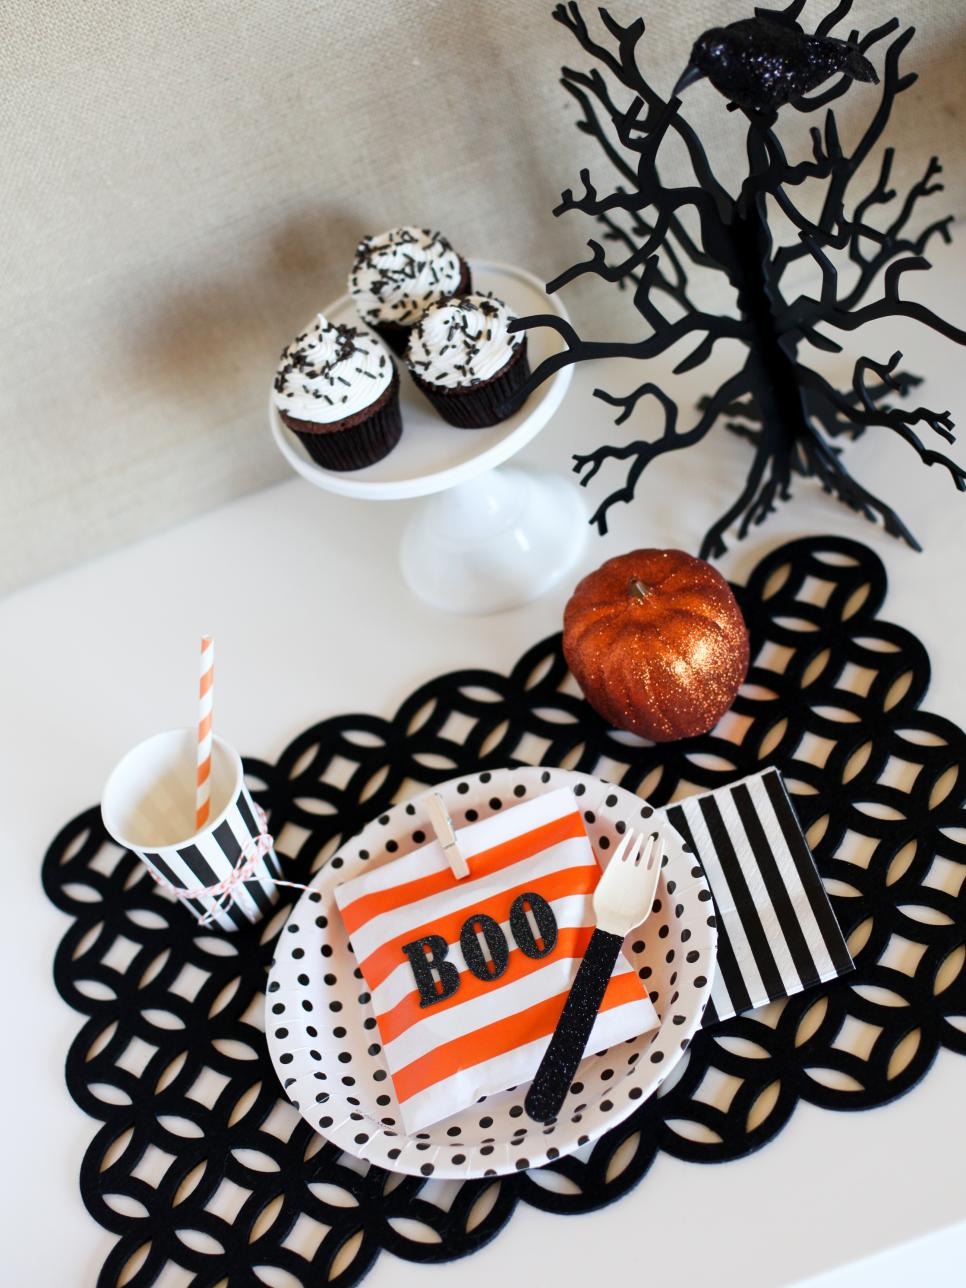 Homemade halloween decorations for kids - Silhouette Pumpkin